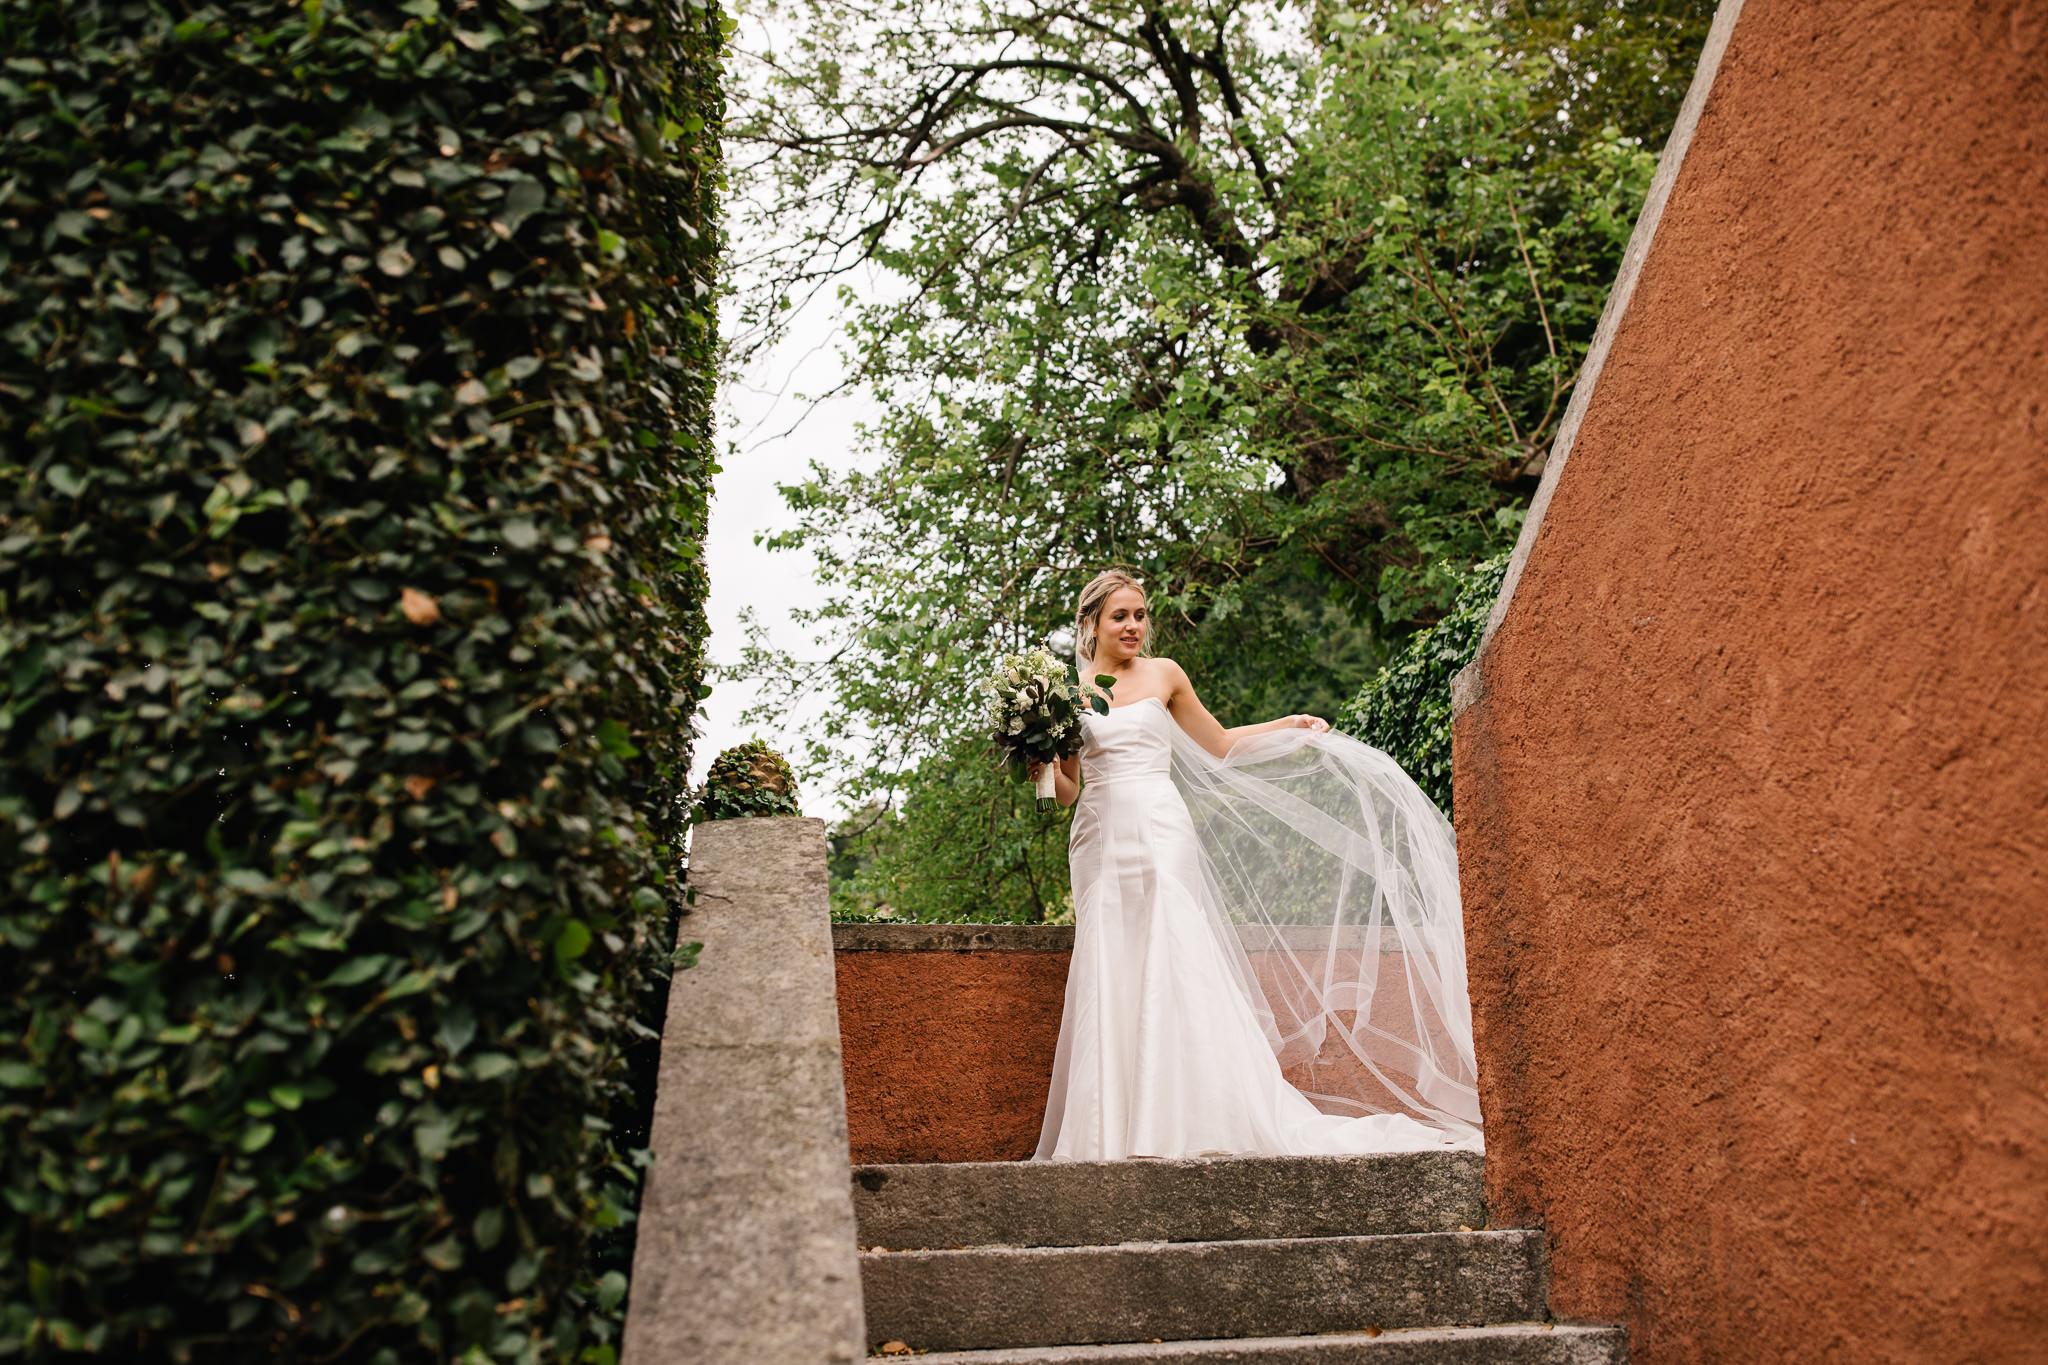 Xyris 21 - fited boned romantic strapless wedding dress.jpg